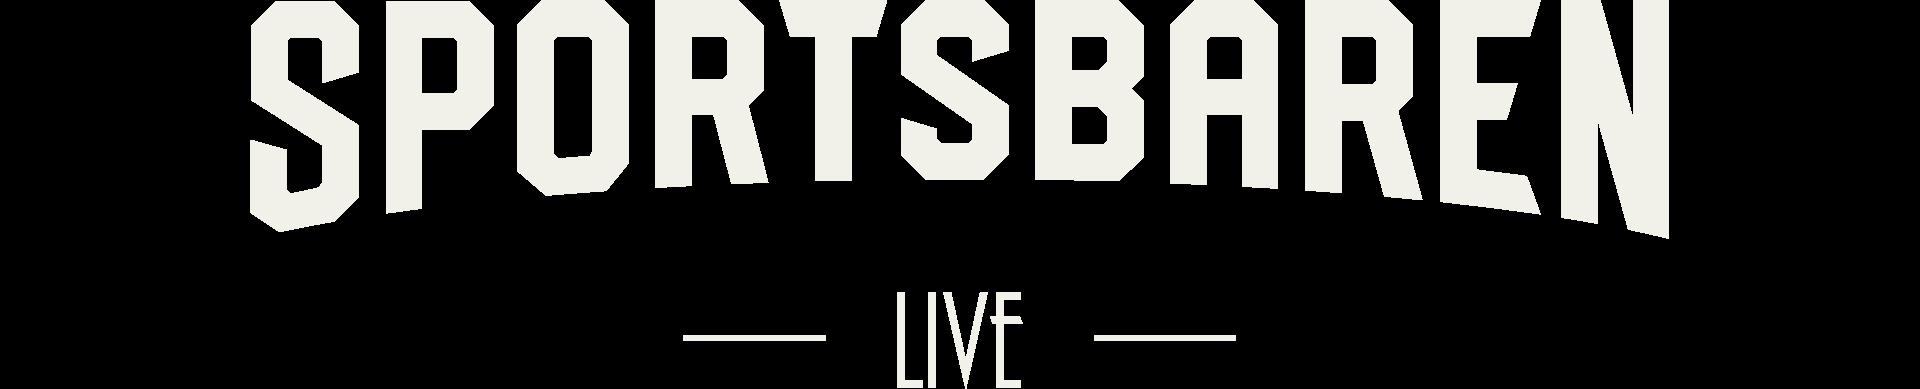 Sportsbaren-live-web-2.png